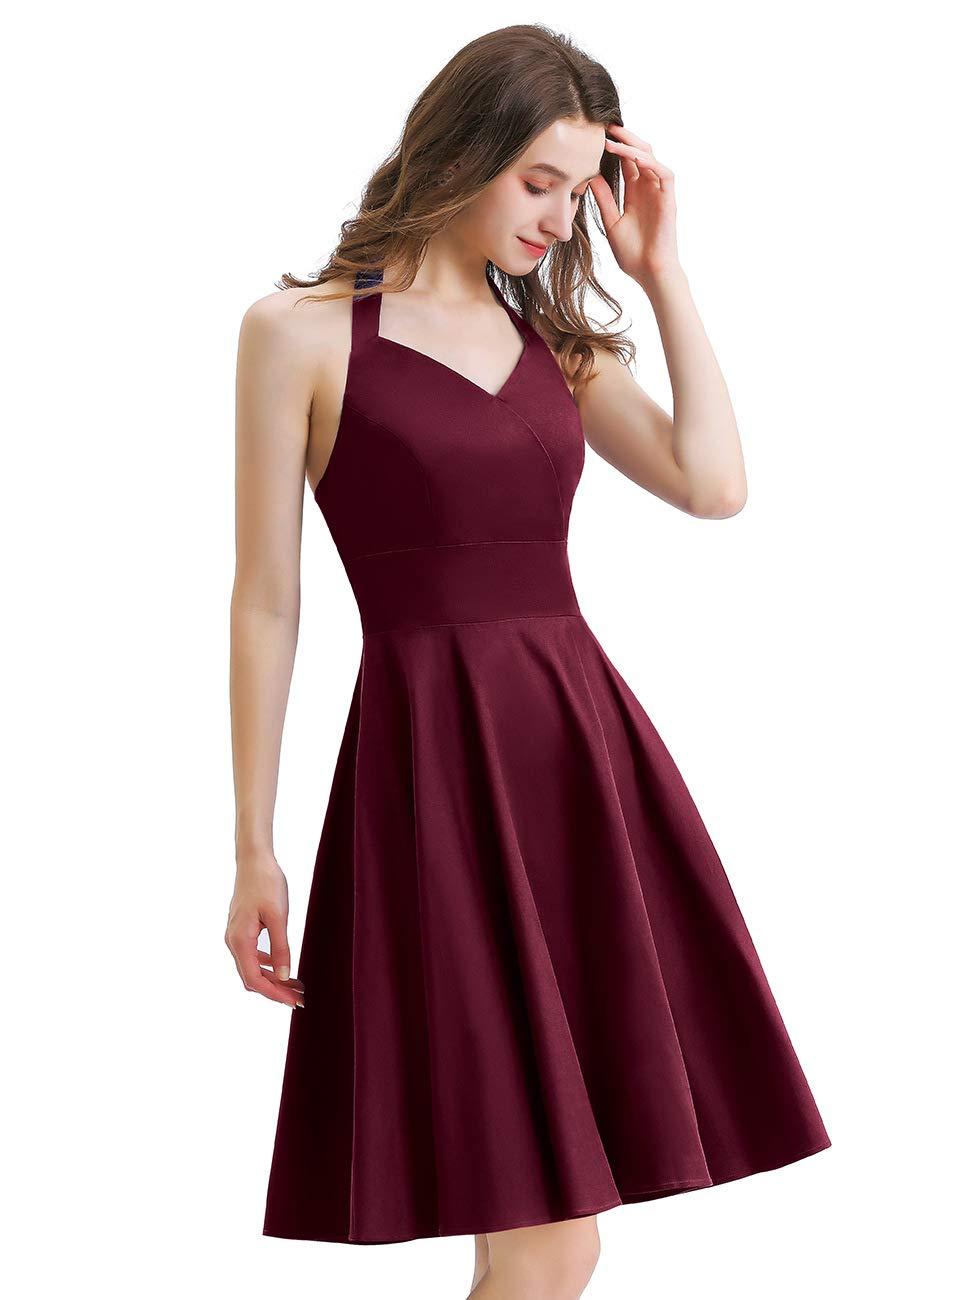 1950 Rockabilly Dresses for Women, Vintage 50s Homecoming Dress V